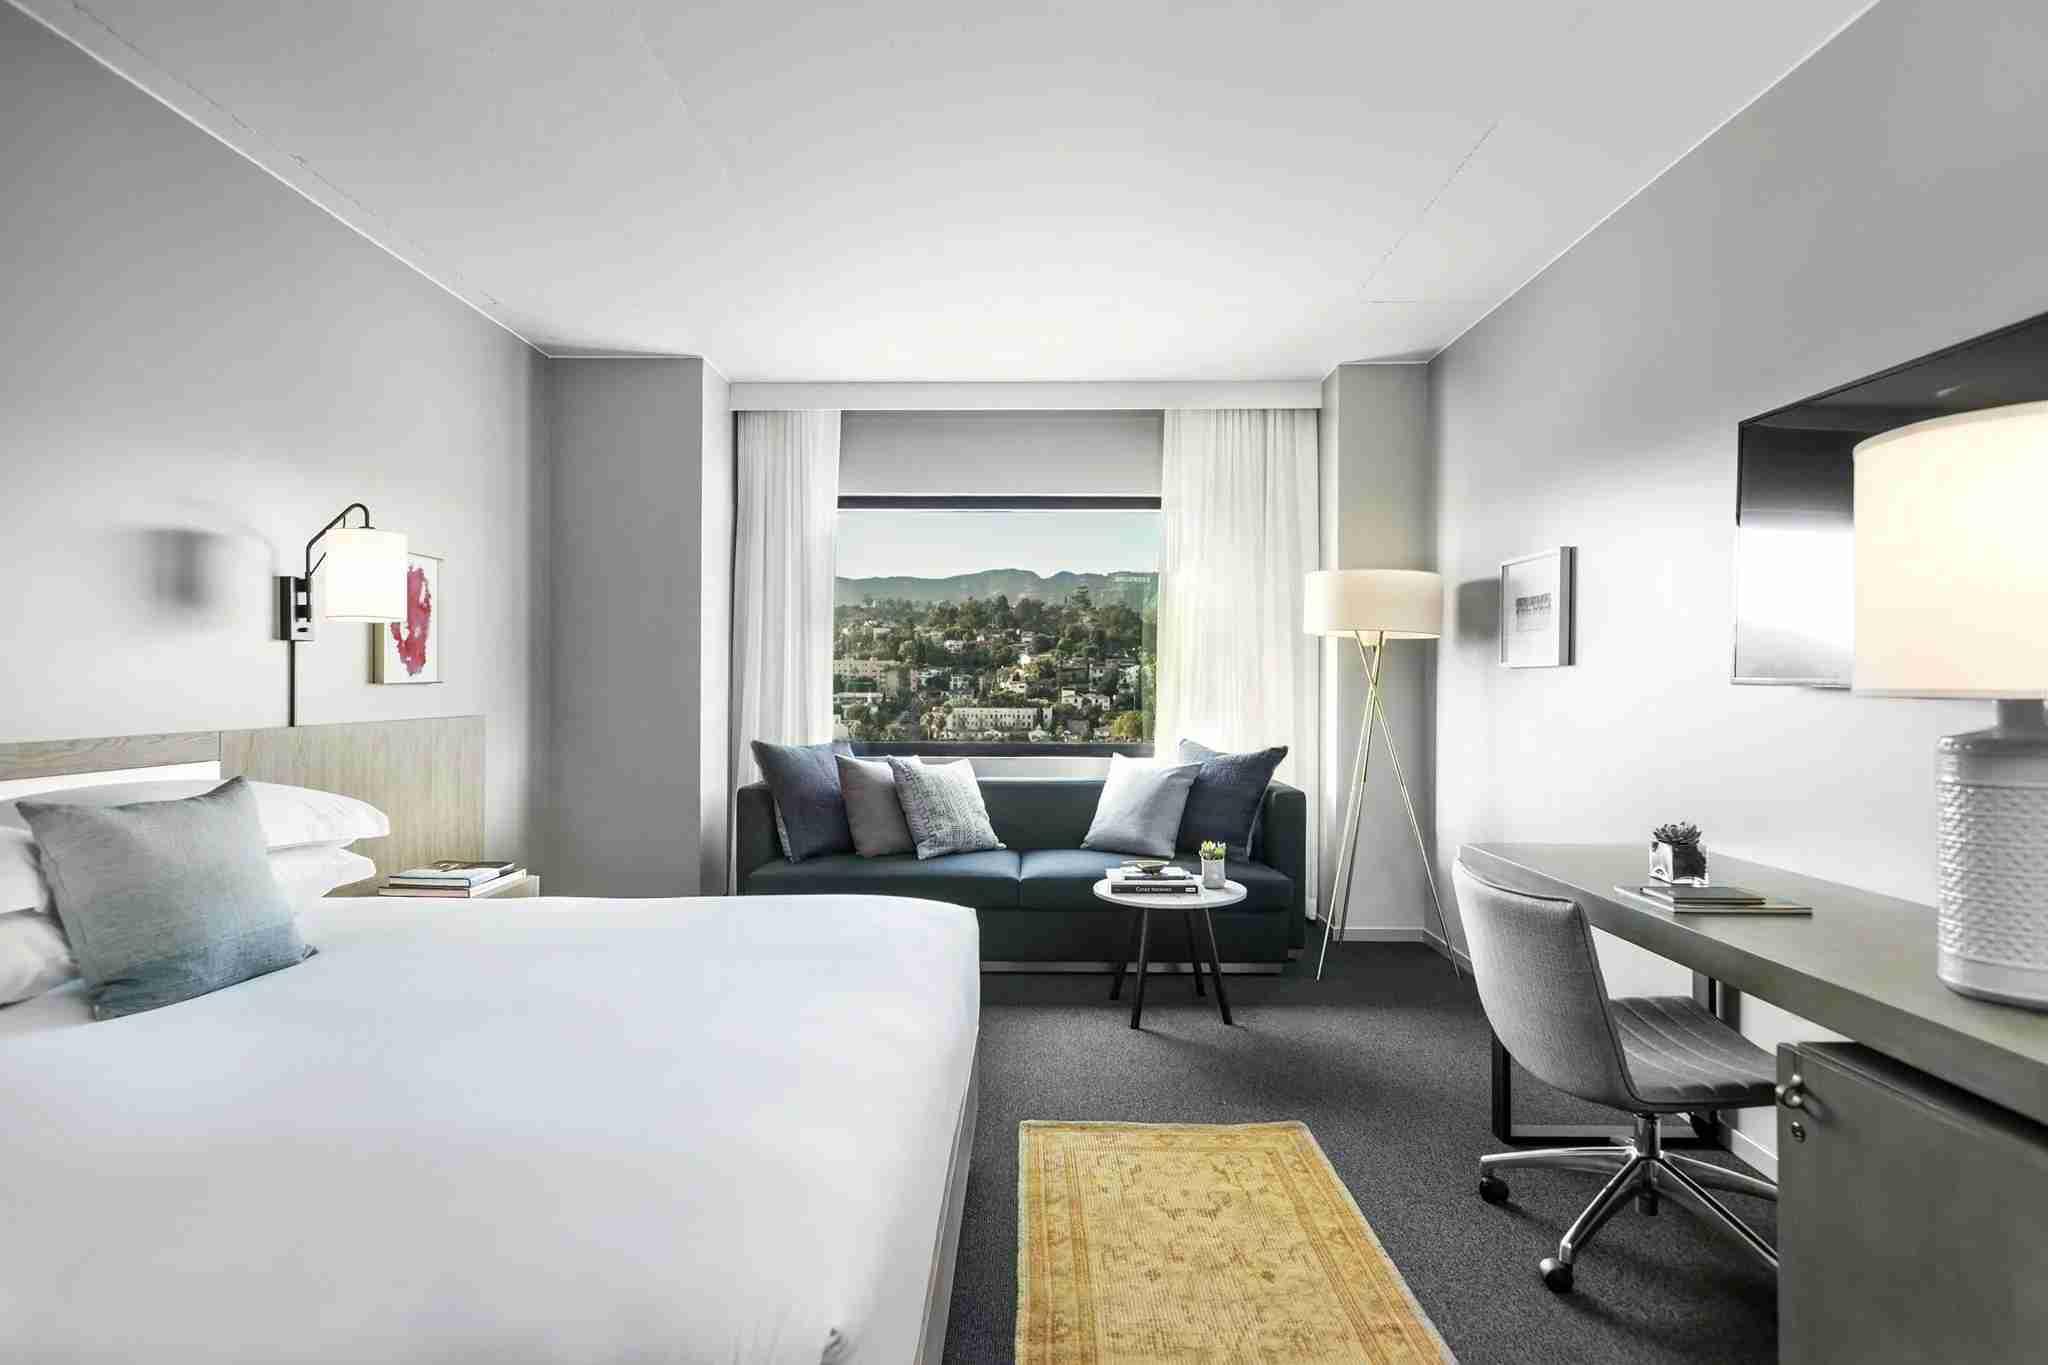 Image courtesy of the Kimpton Everly Hollywood Hotel